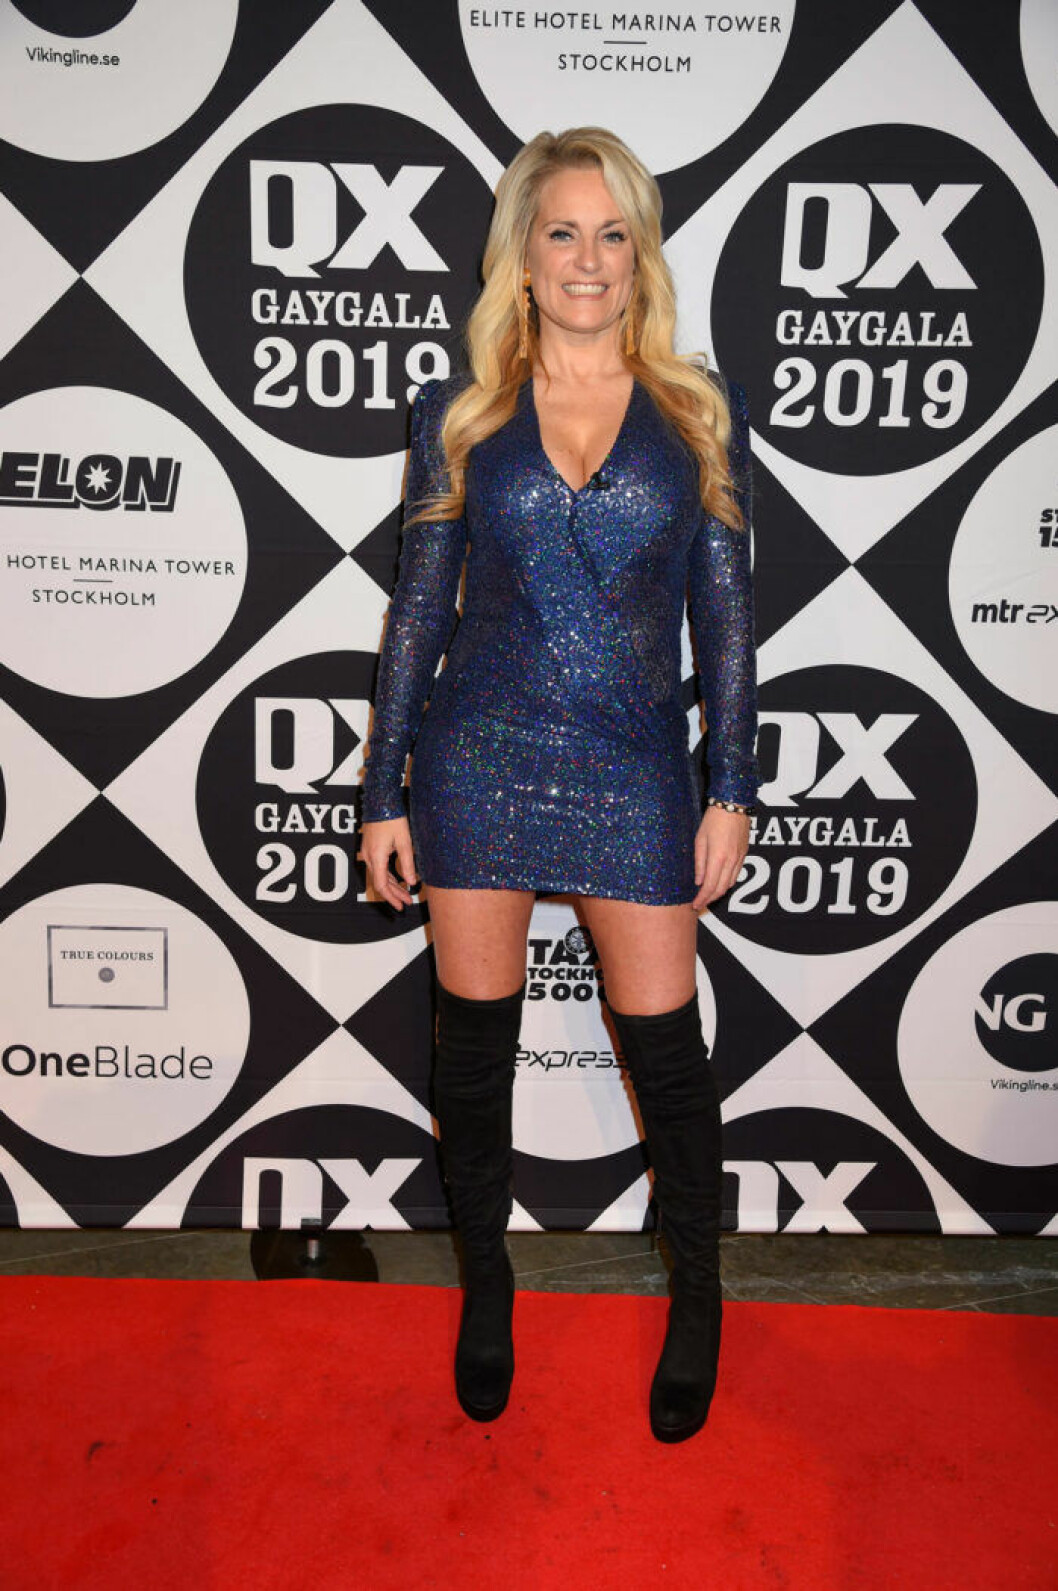 Laila Bagge på QX-galan 2019